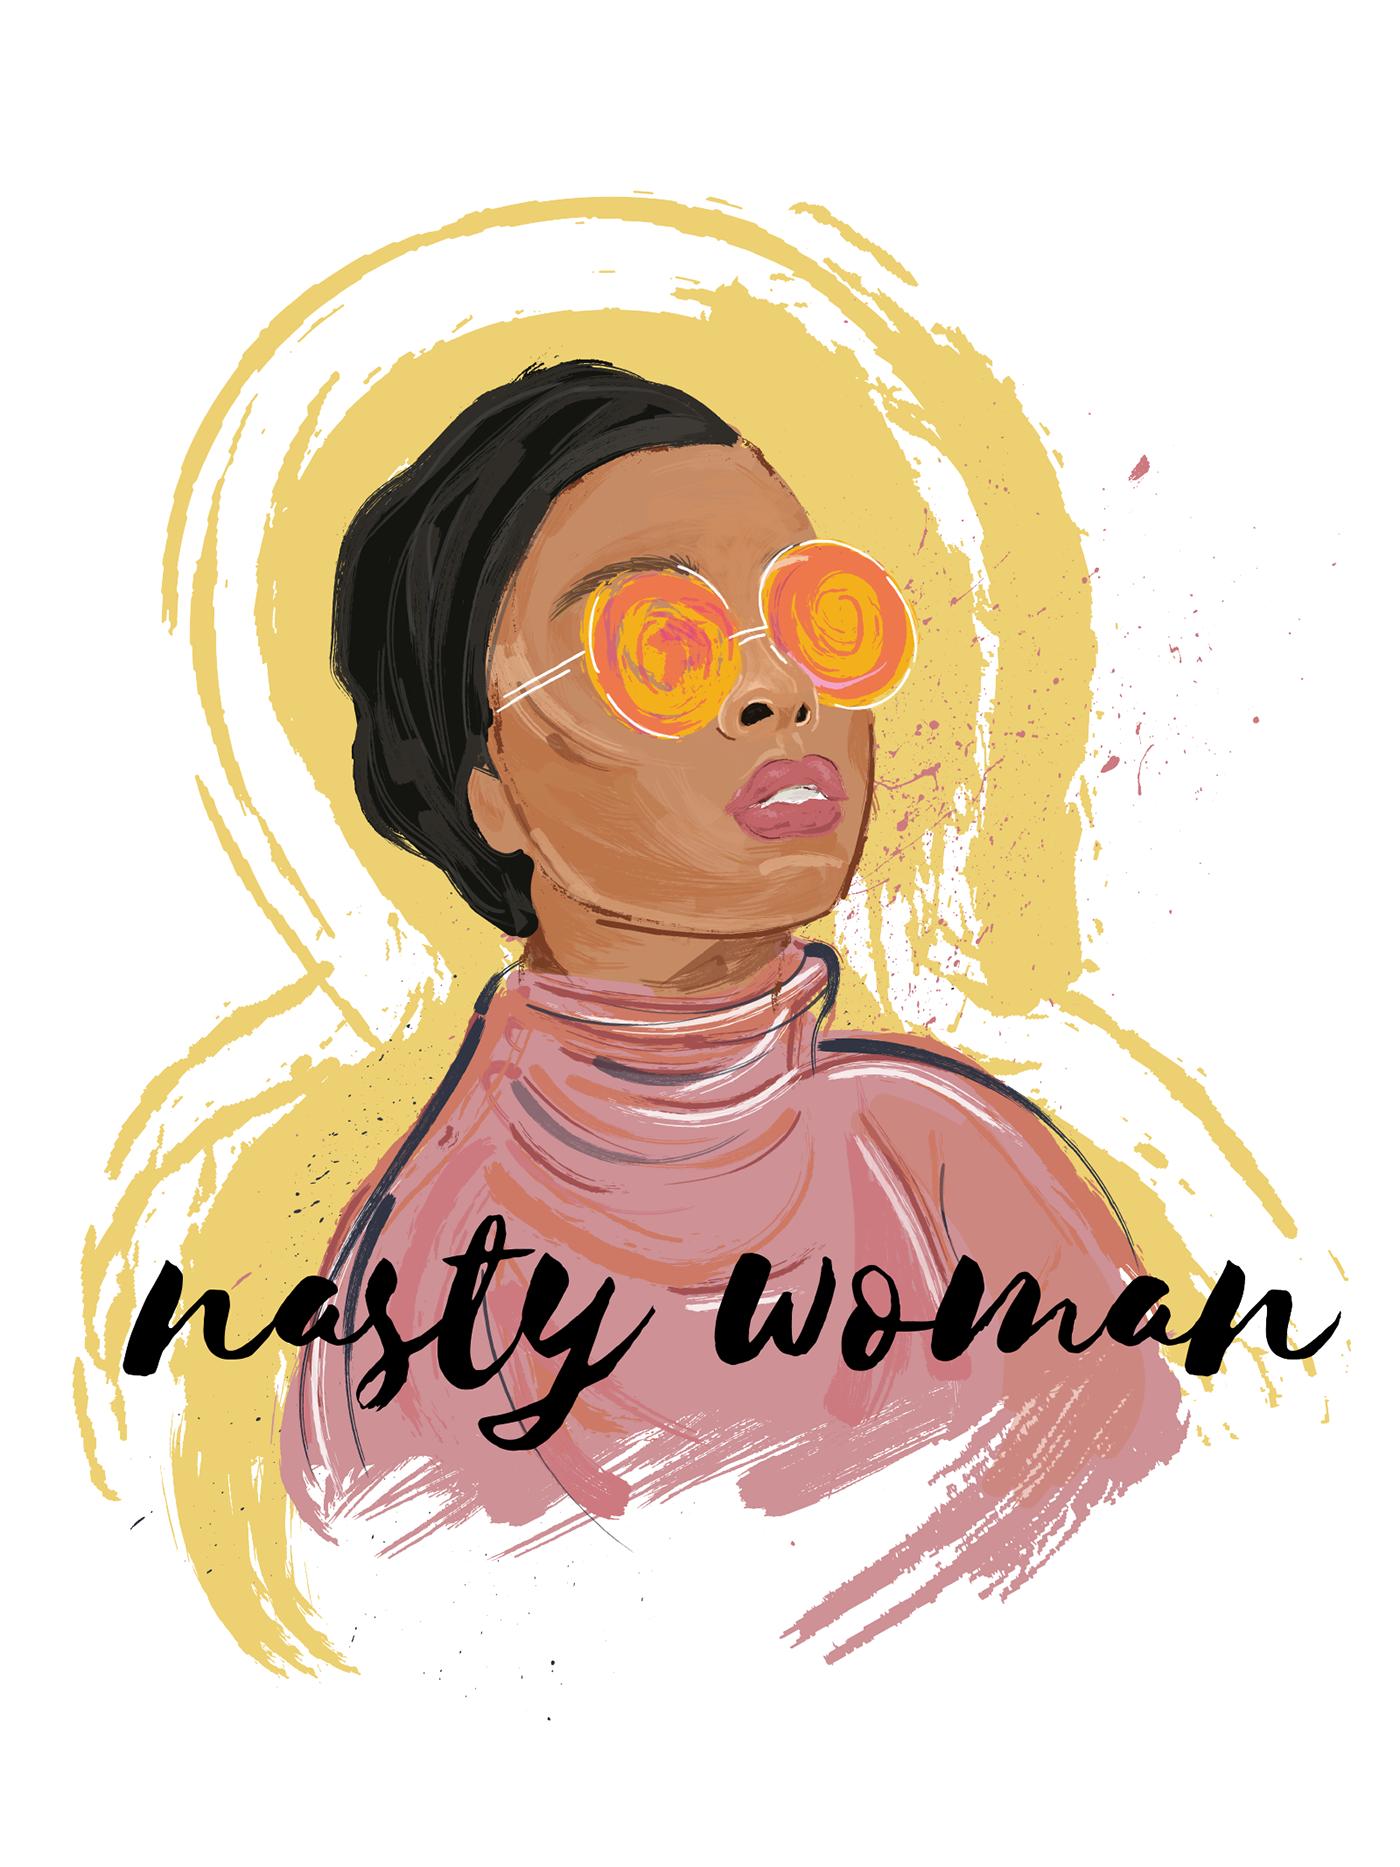 Nasty Woman Resist portest feminisim feminist ILLUSTRATION  adobe illustrator digital painting brushes Custom Brush